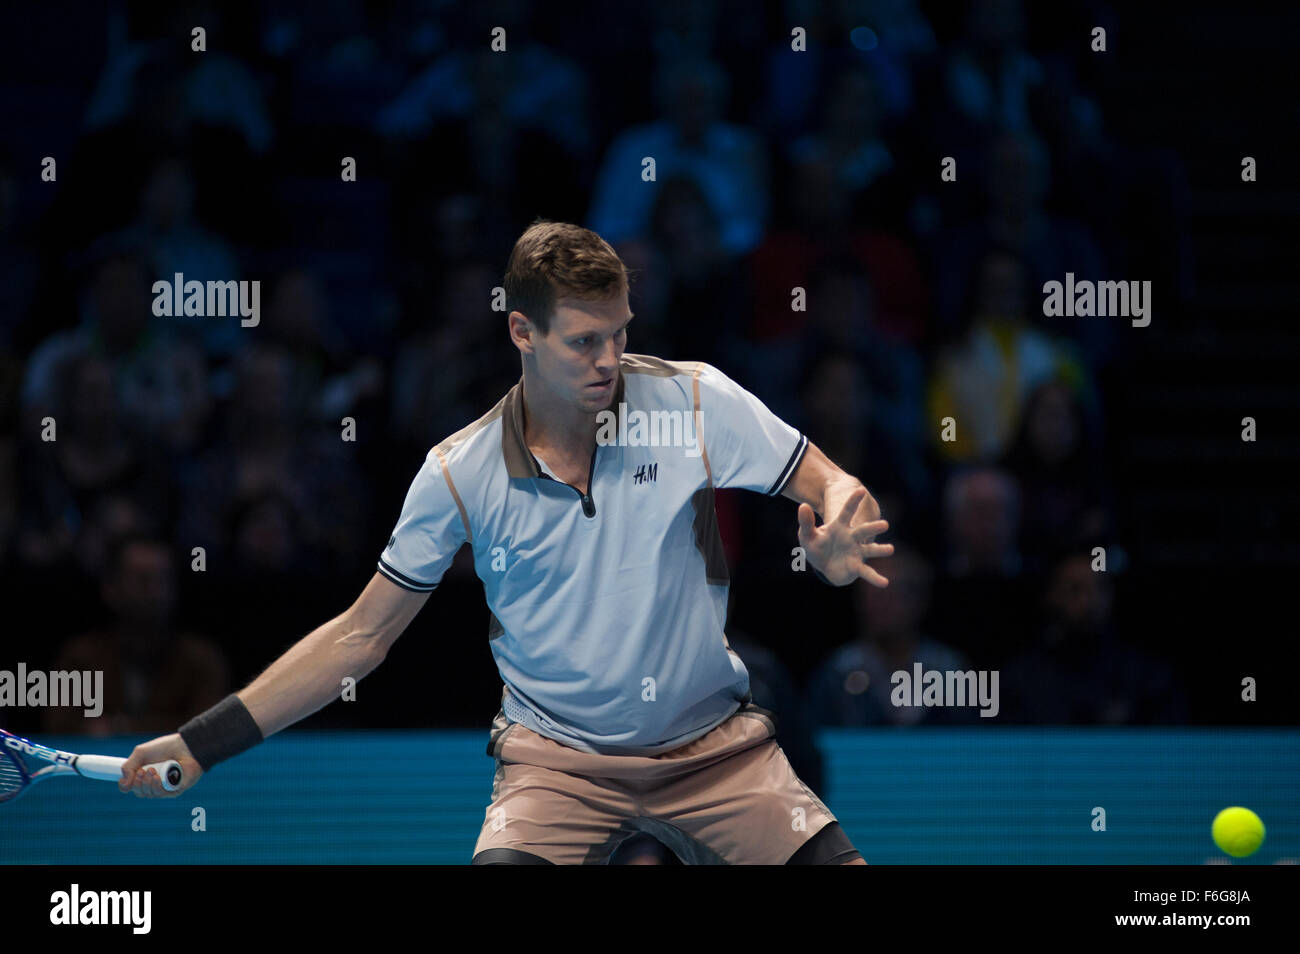 O2 Arena, London, UK. 17th Nov, 2015. Barclays ATP World Tour Finals. Tomas Berdych (CZE) vs Kei Nishikori (JPN) Stock Photo